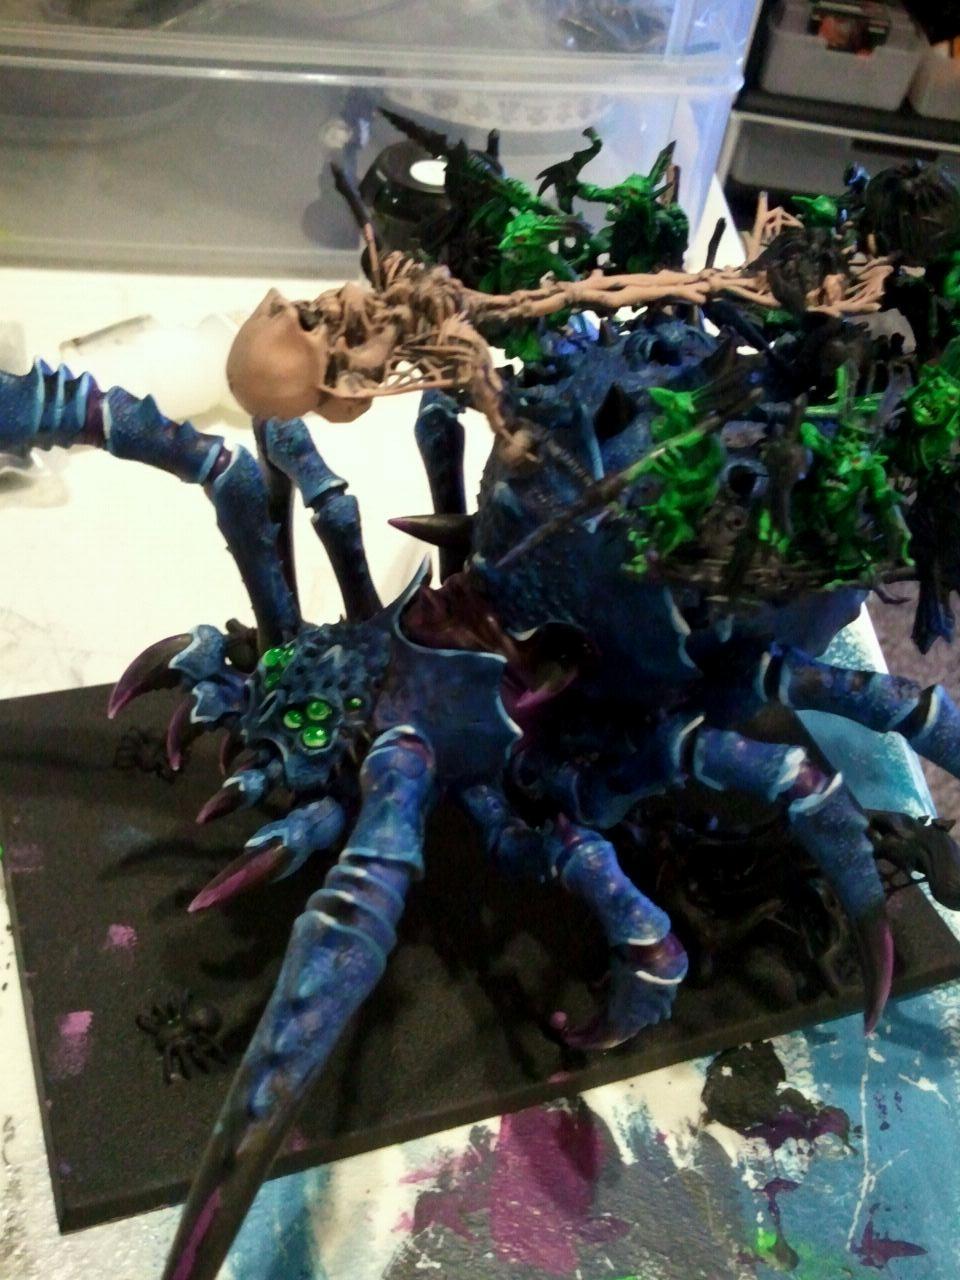 Arachnarock, Painted, Skeletons, Spider, Work In Progress